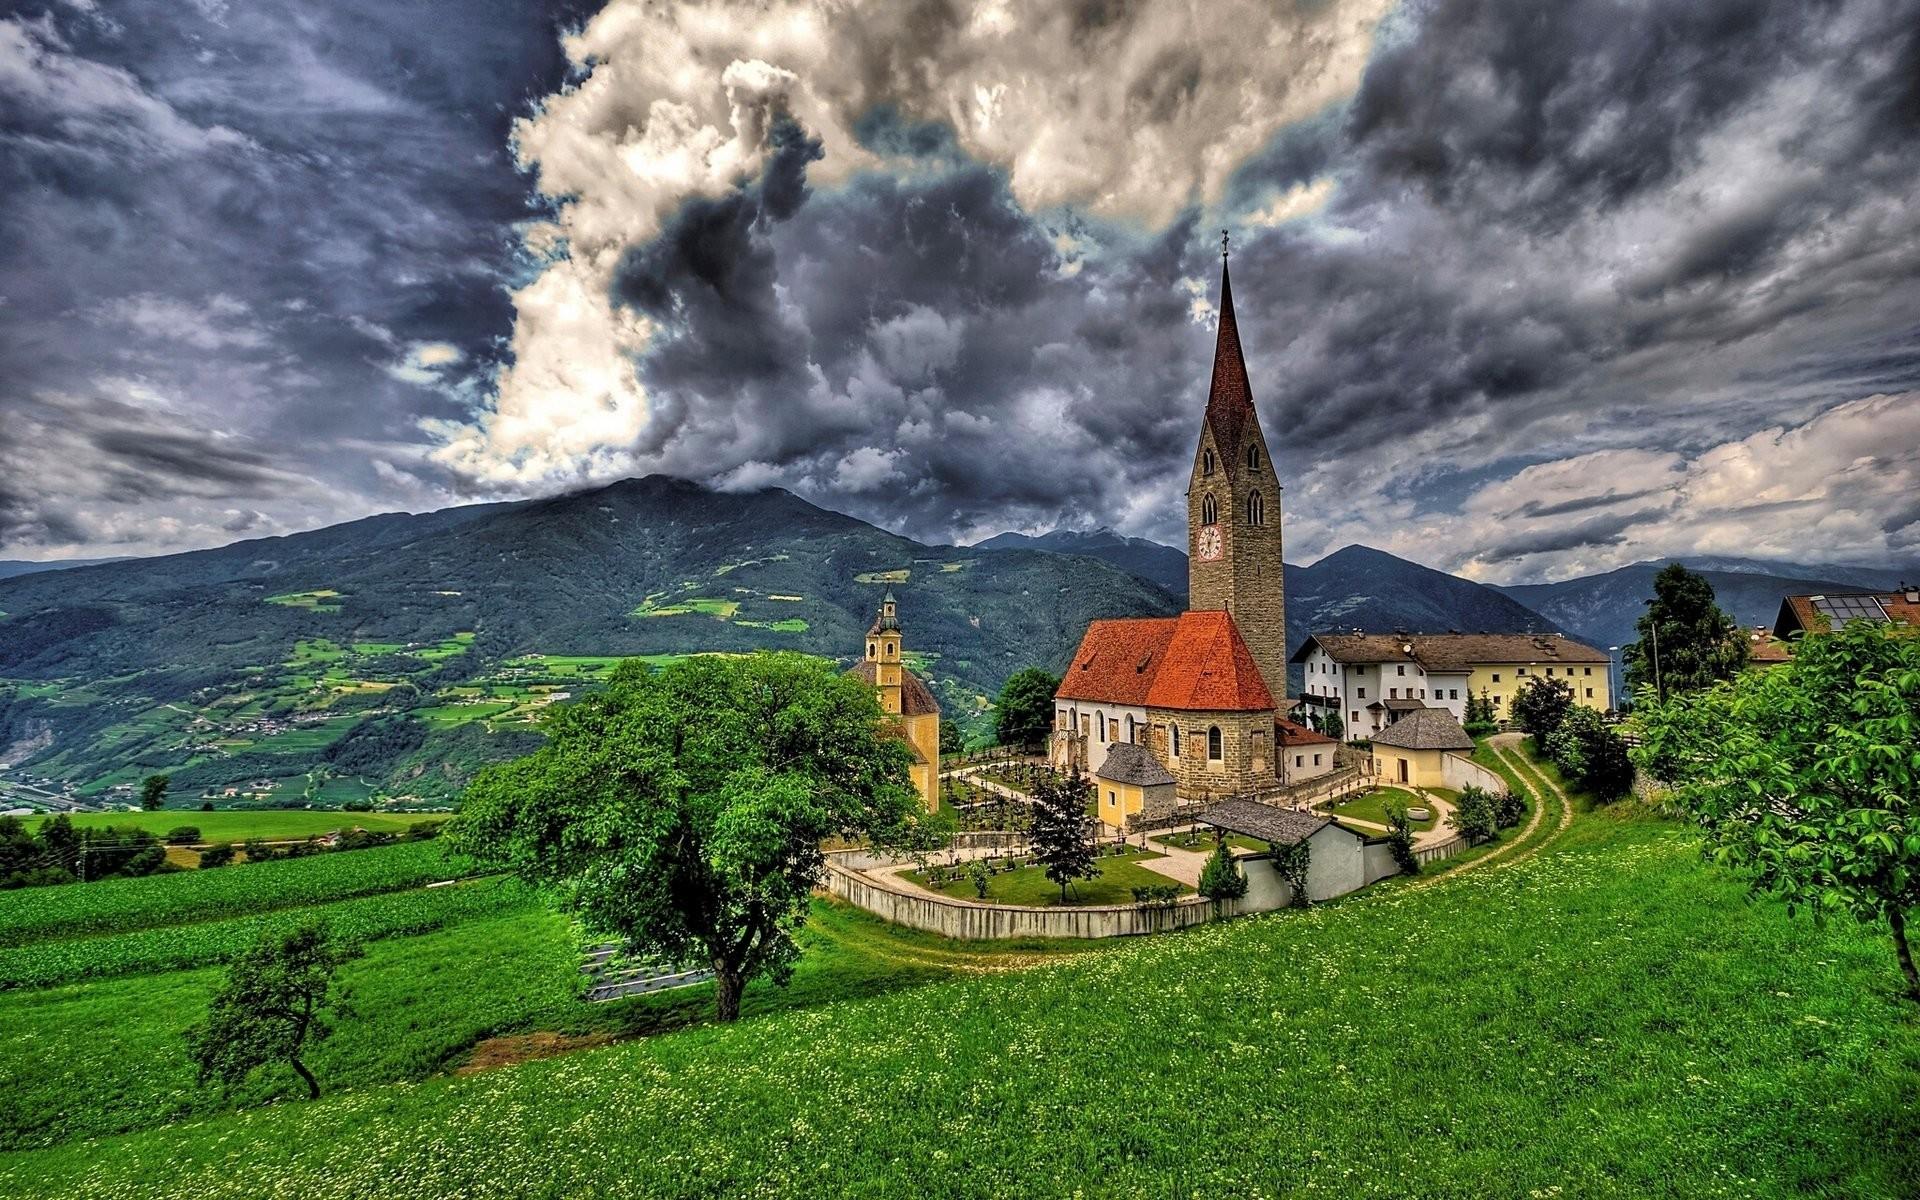 bressanone brixen italy saint michael church alps brixen bressanone italy  church of san michele alps mountain